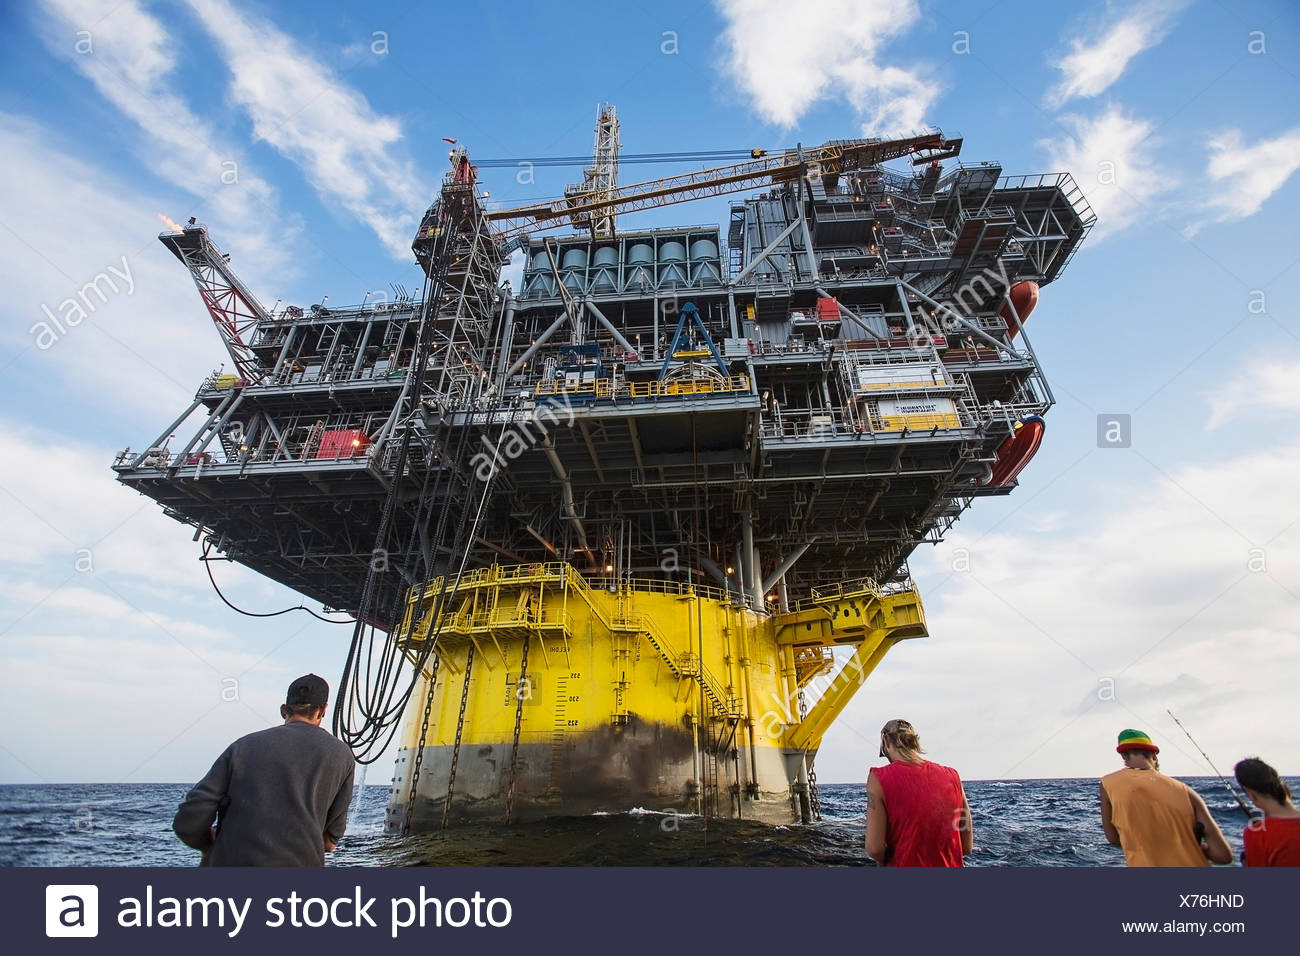 Perdido (oil platform) - Wikipedia